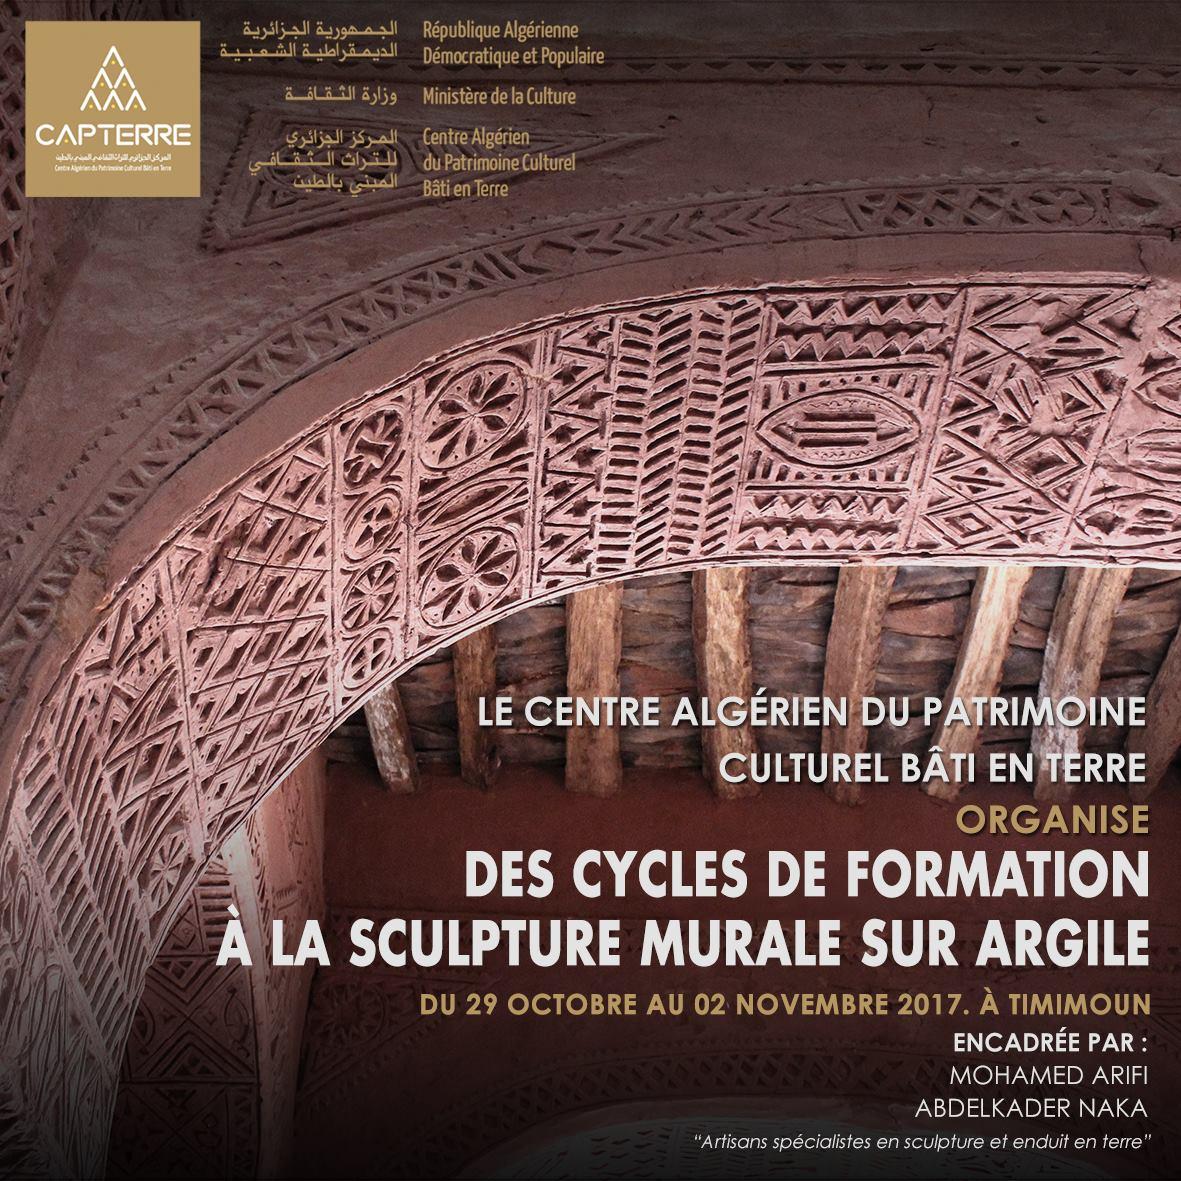 Des cycles de formation a la sculpture murale sur argile. MediTERRE, the network of Mediterranean professionals of raw earth construction.